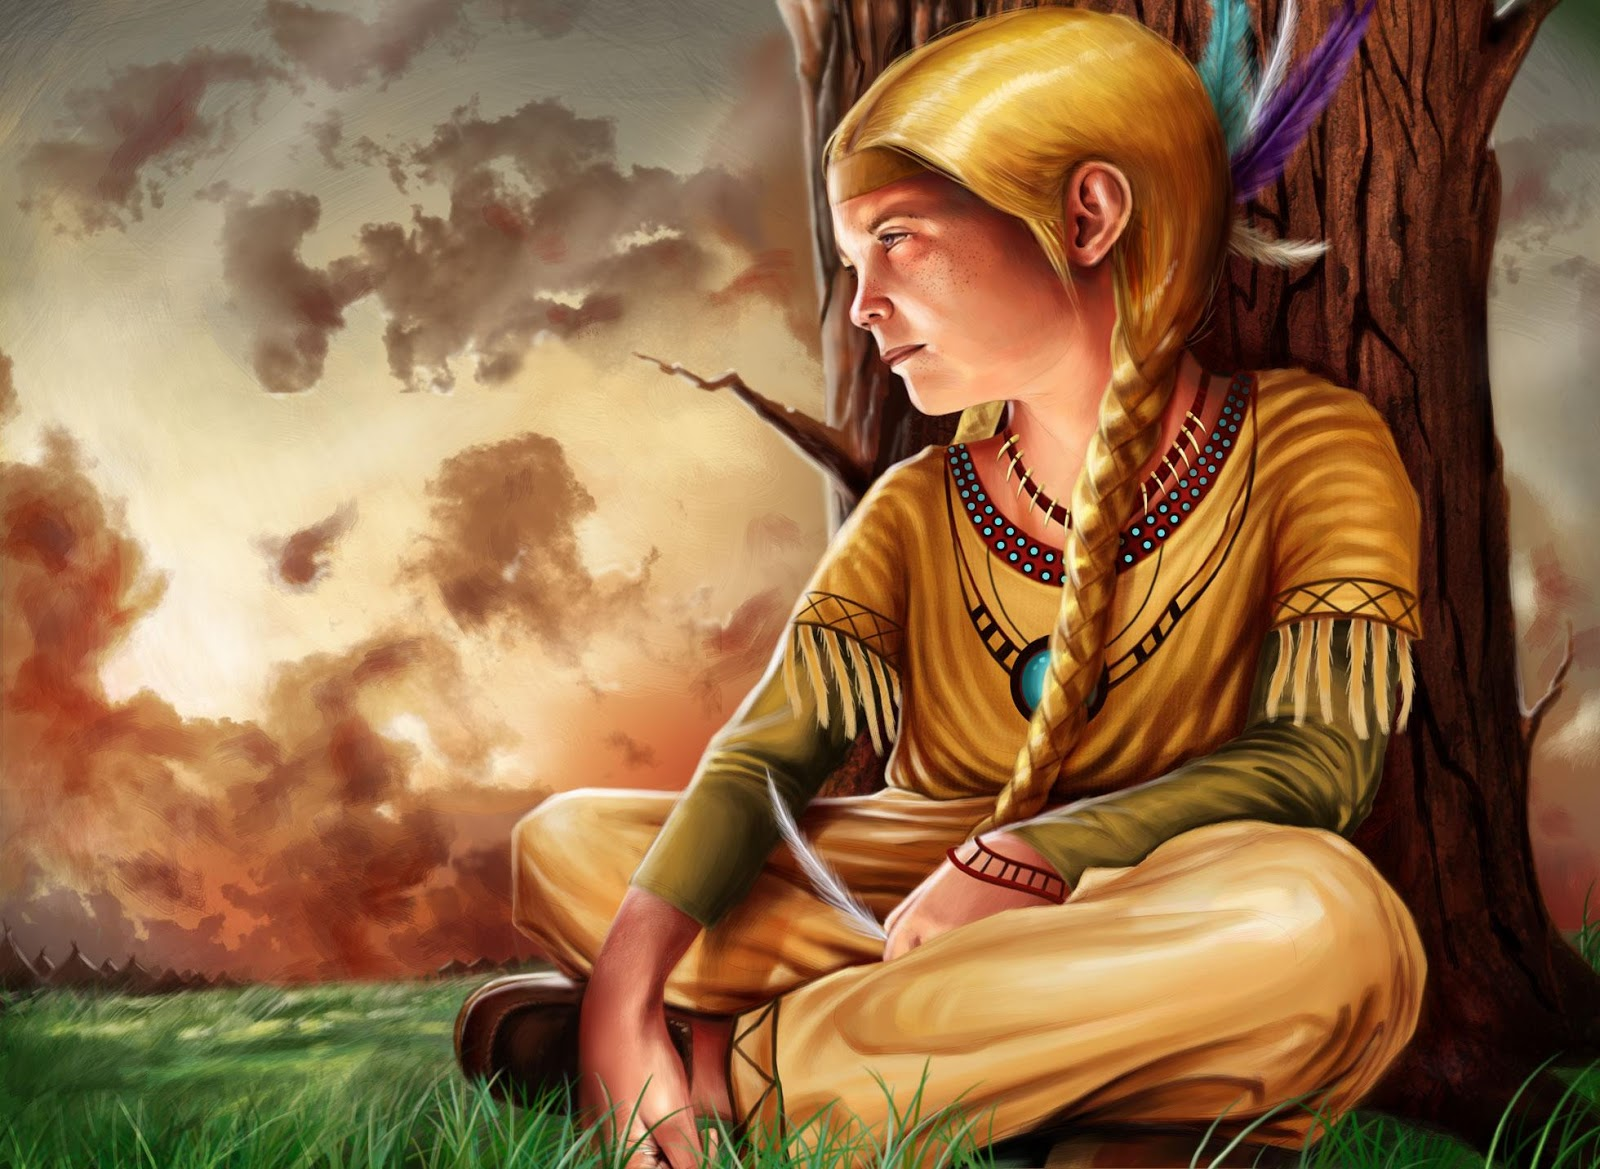 http://1.bp.blogspot.com/-U9m-nW_BXpI/UOsC3wEJGUI/AAAAAAAAL0U/RyXbe59dkJo/s1600/1960x1432_1472_Badger_Boy_2d_illustration_fantasy_indian_picture_image_digital_art.jpg